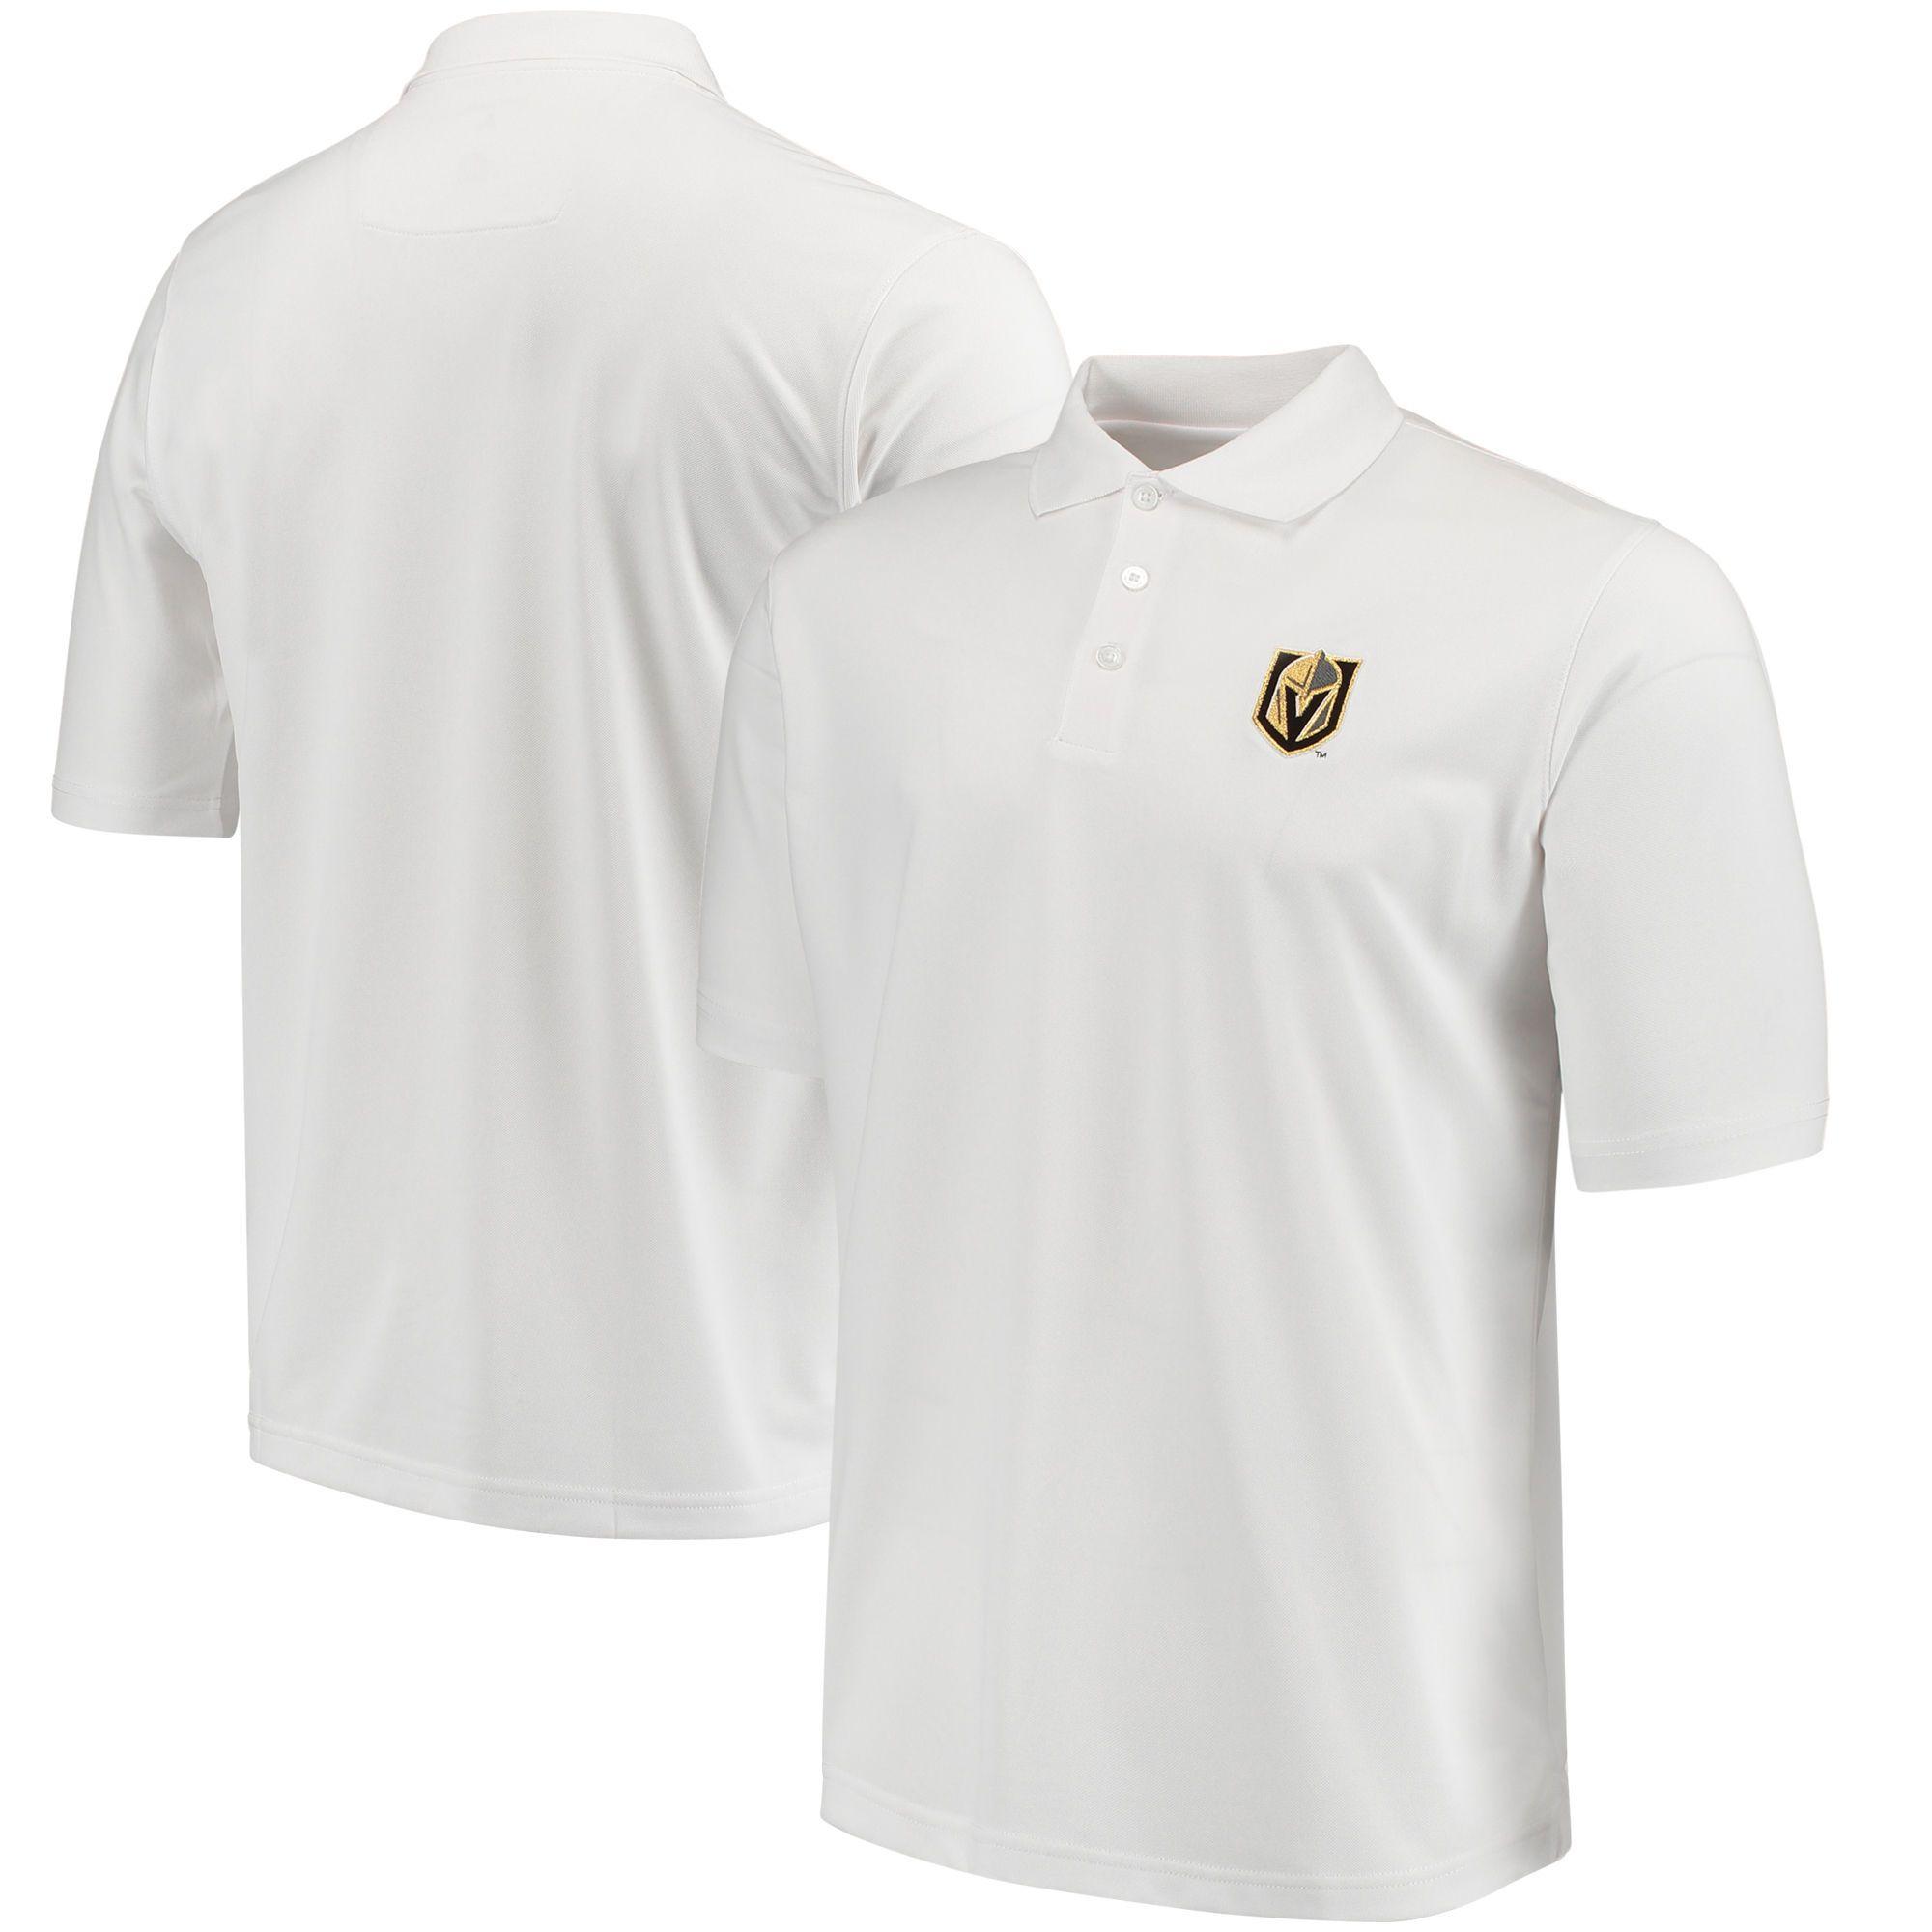 Vegas Golden Knights Fanatics Branded 2018 Western Conference Champions  Interference Basketball Jerseys